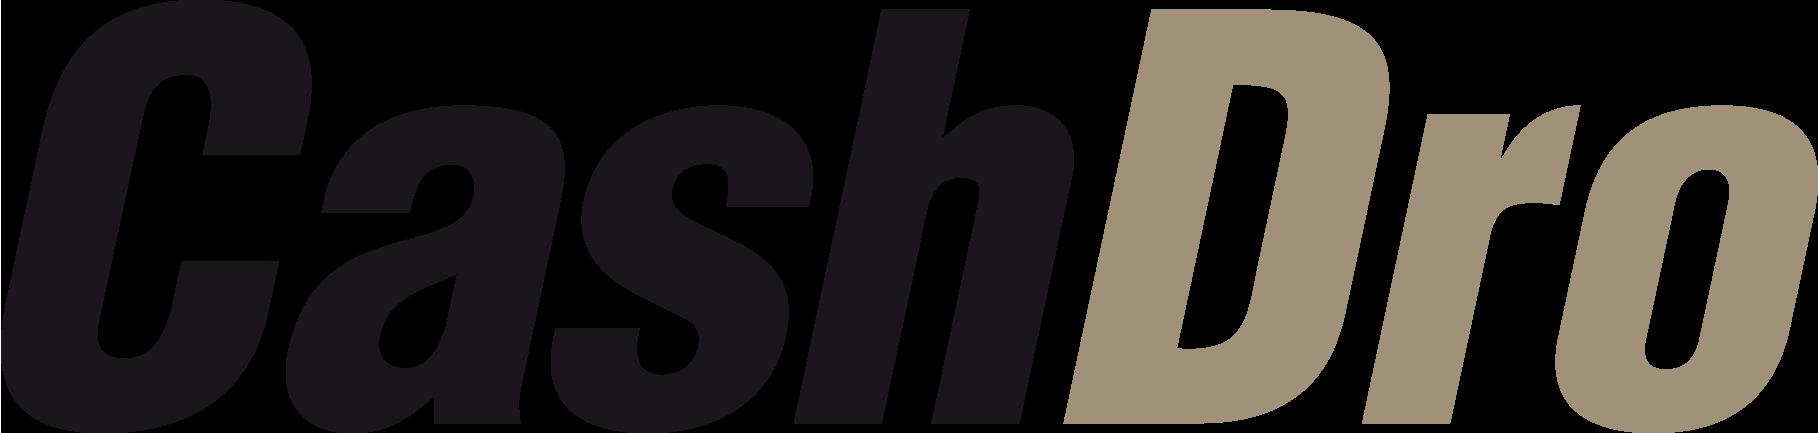 Cash Dro